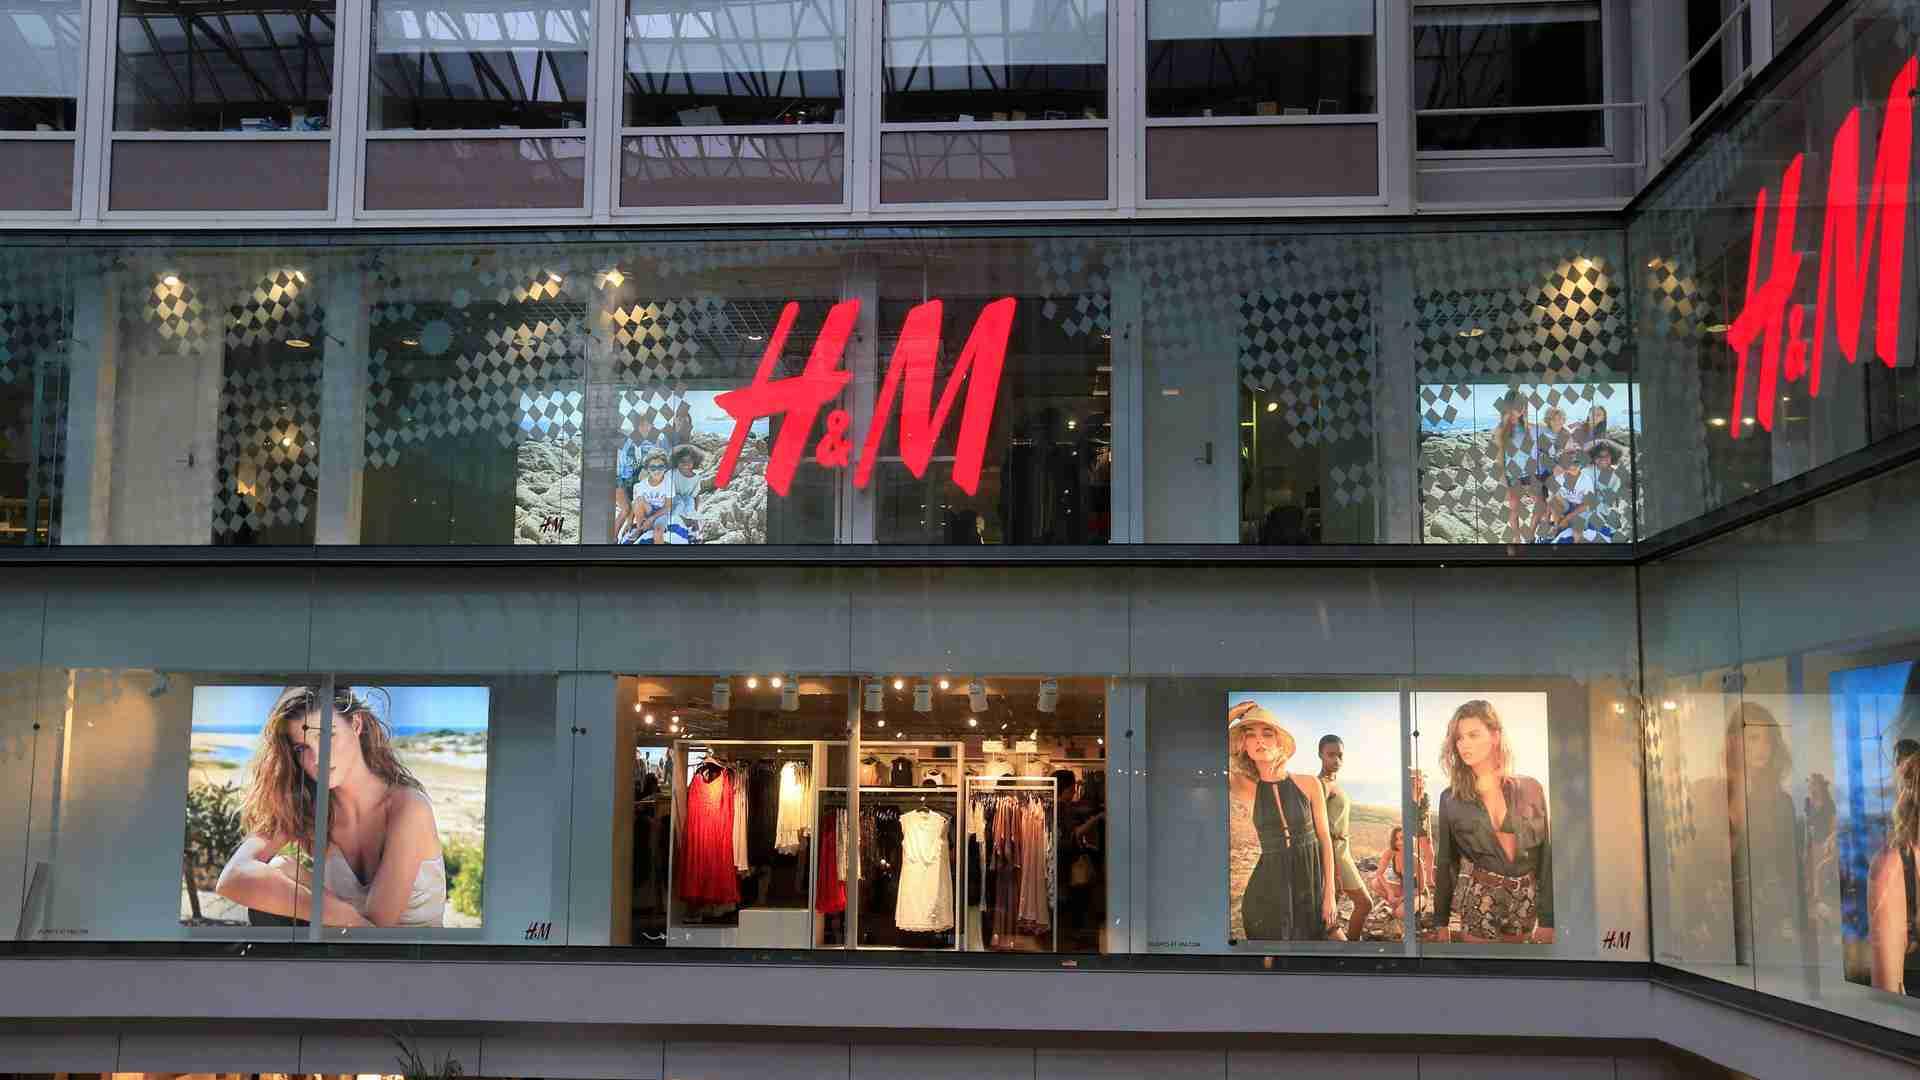 H&Mがデンマークで毎年12トンの売れ残り衣類を焼却処分 テレビ局が報道(鐙麻樹) - 個人 - Yahoo!ニュース